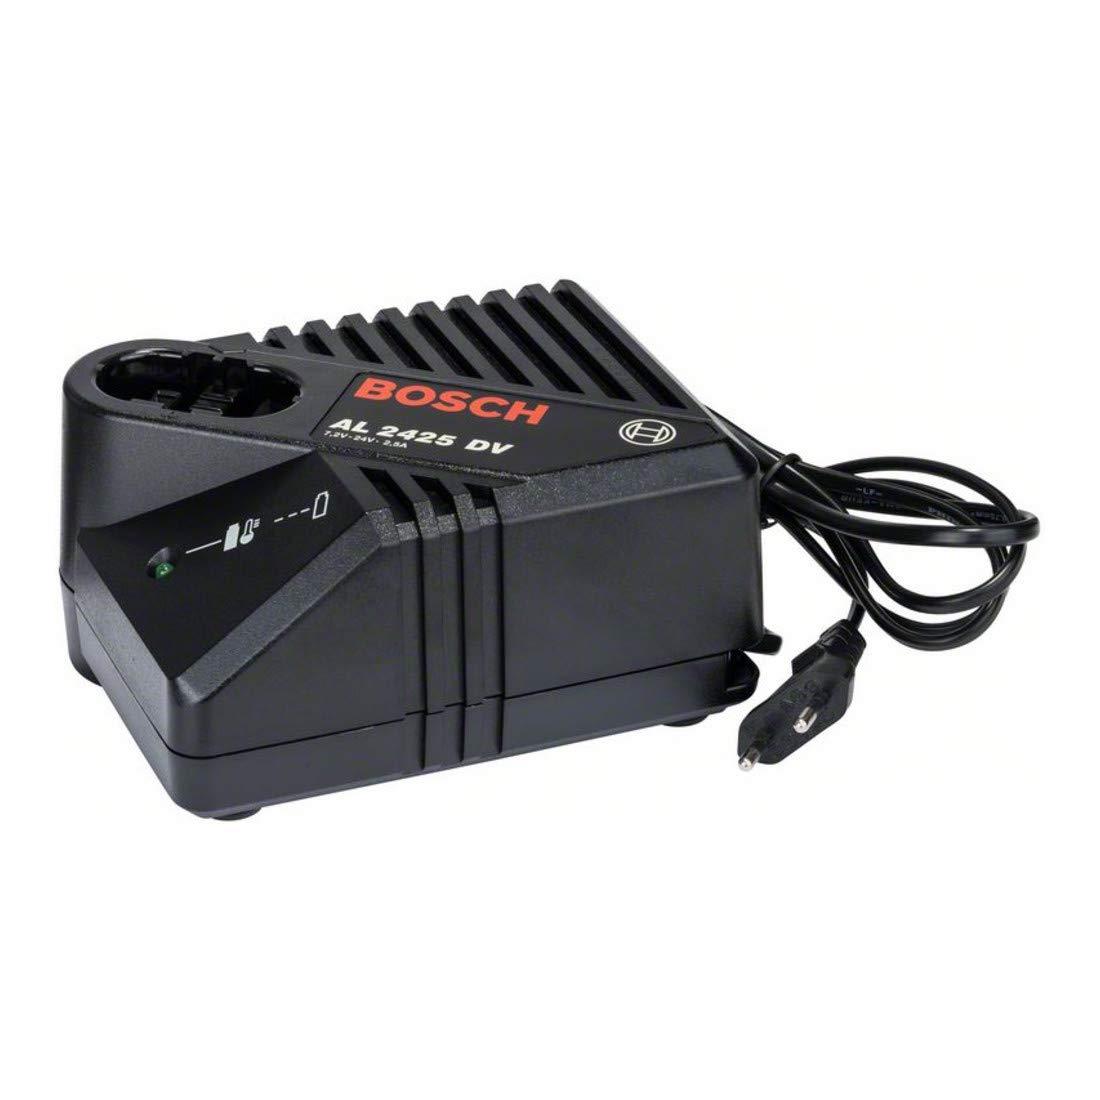 Bosch 2 607 224 426 Cargador est/ándar AL 2425 DV 230 V pack de 1 2,5 A EU